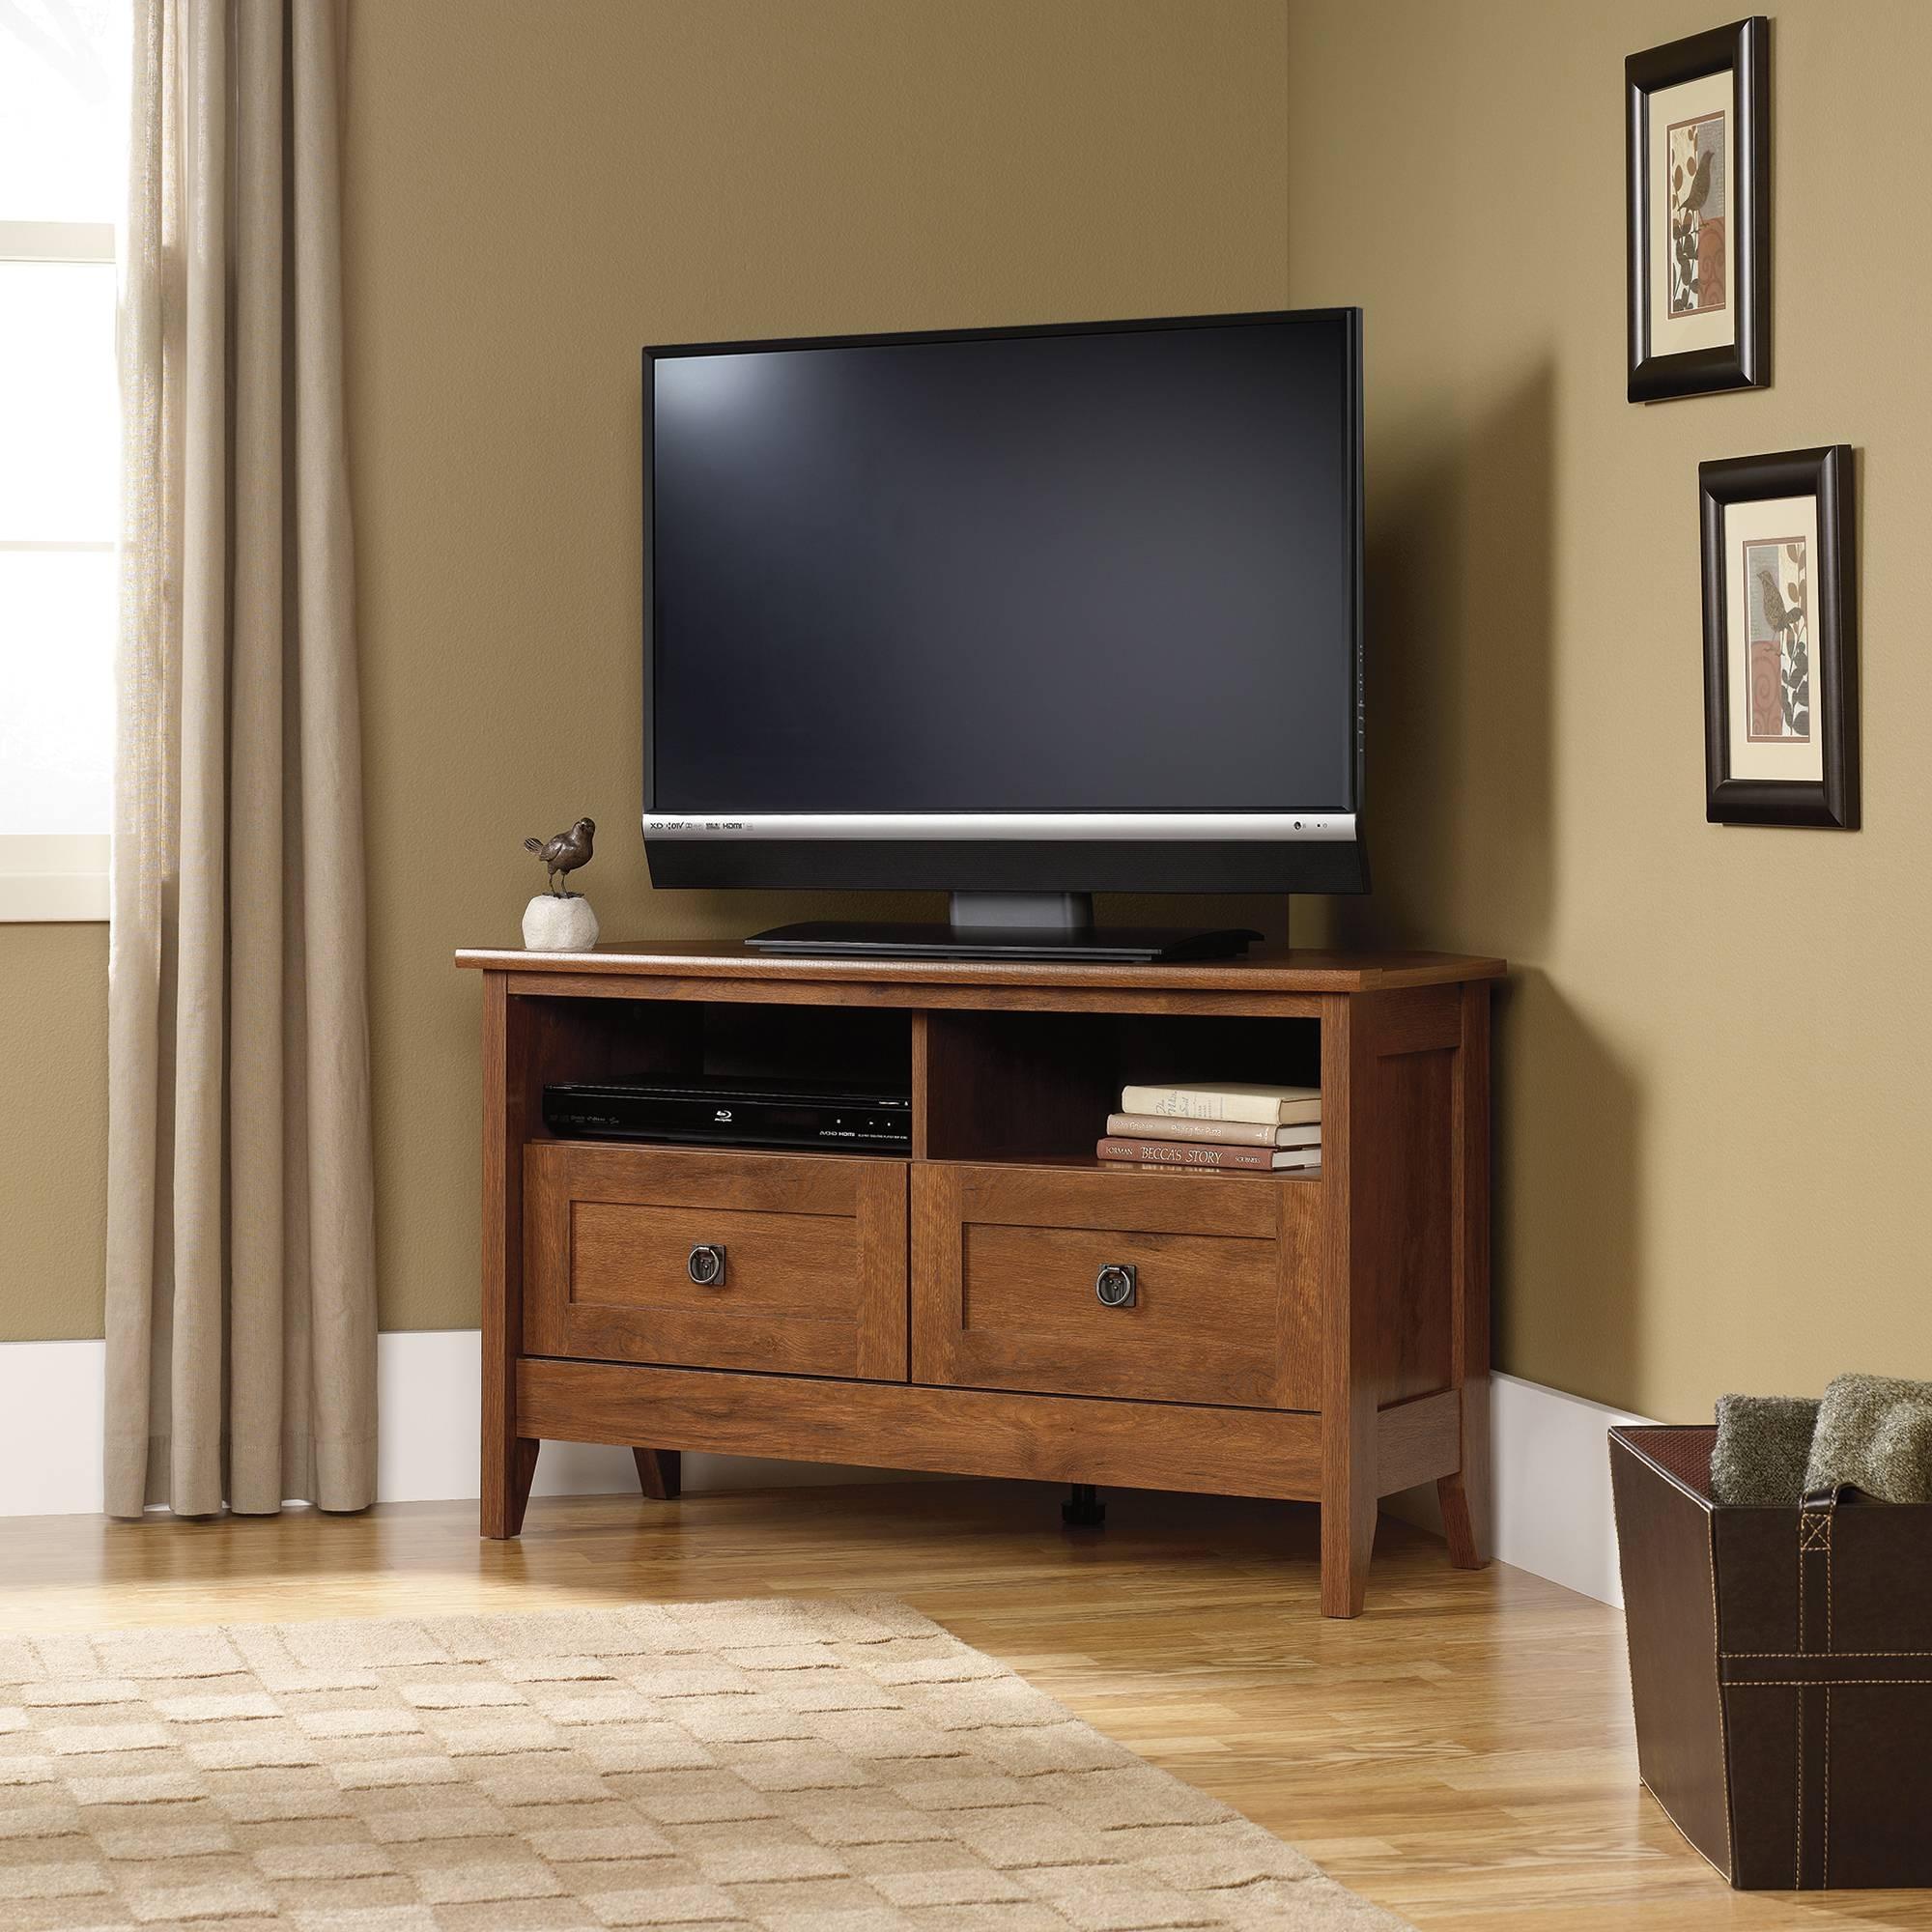 Sauder Select | Corner Tv Stand | 410627 | Sauder regarding Dark Brown Corner Tv Stands (Image 9 of 15)